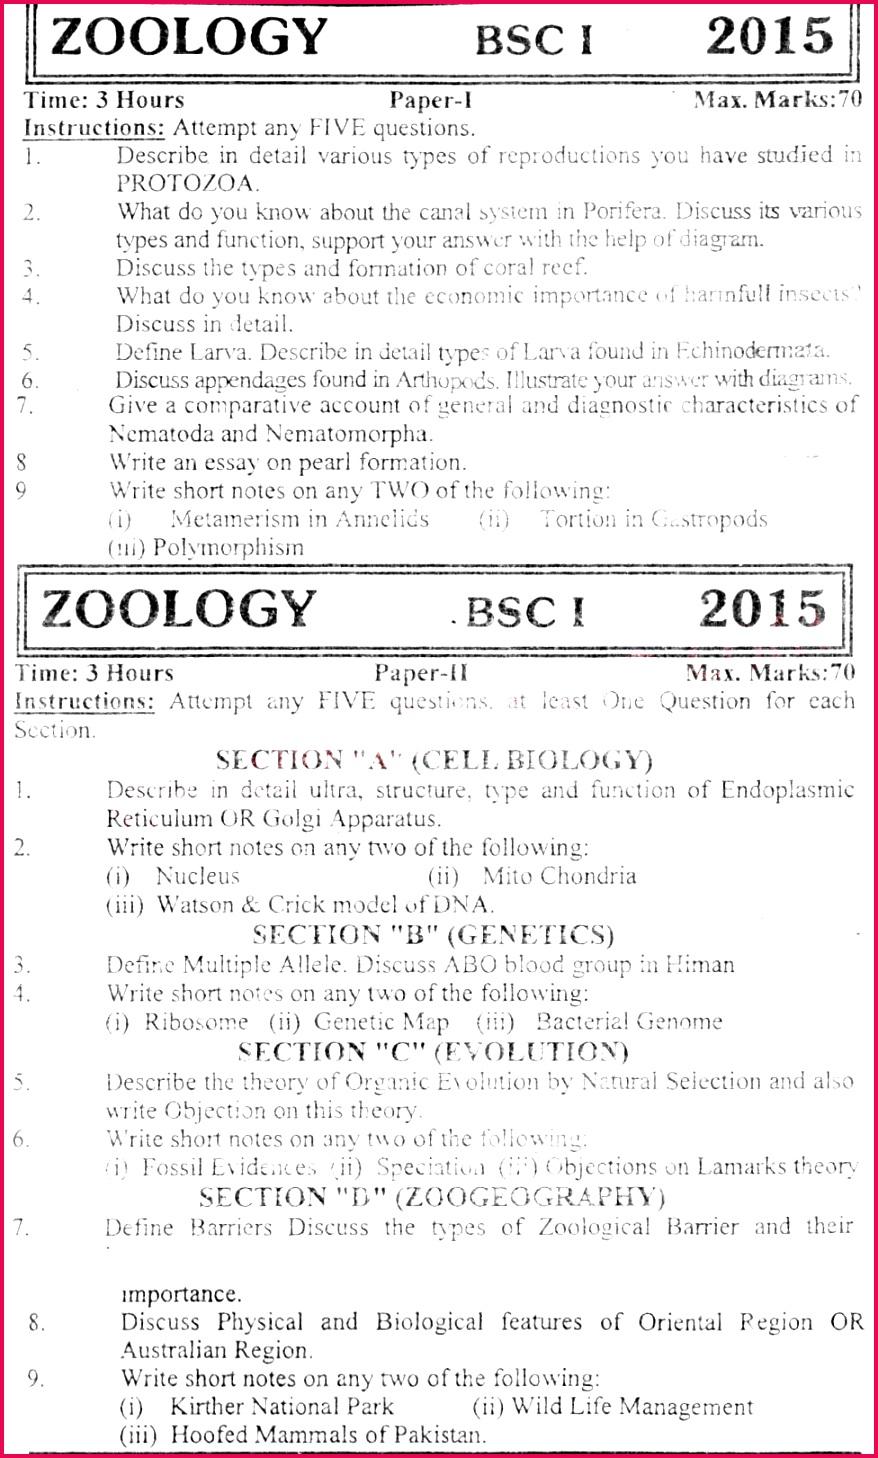 University of Karachi BSc Past Paper 11 2015